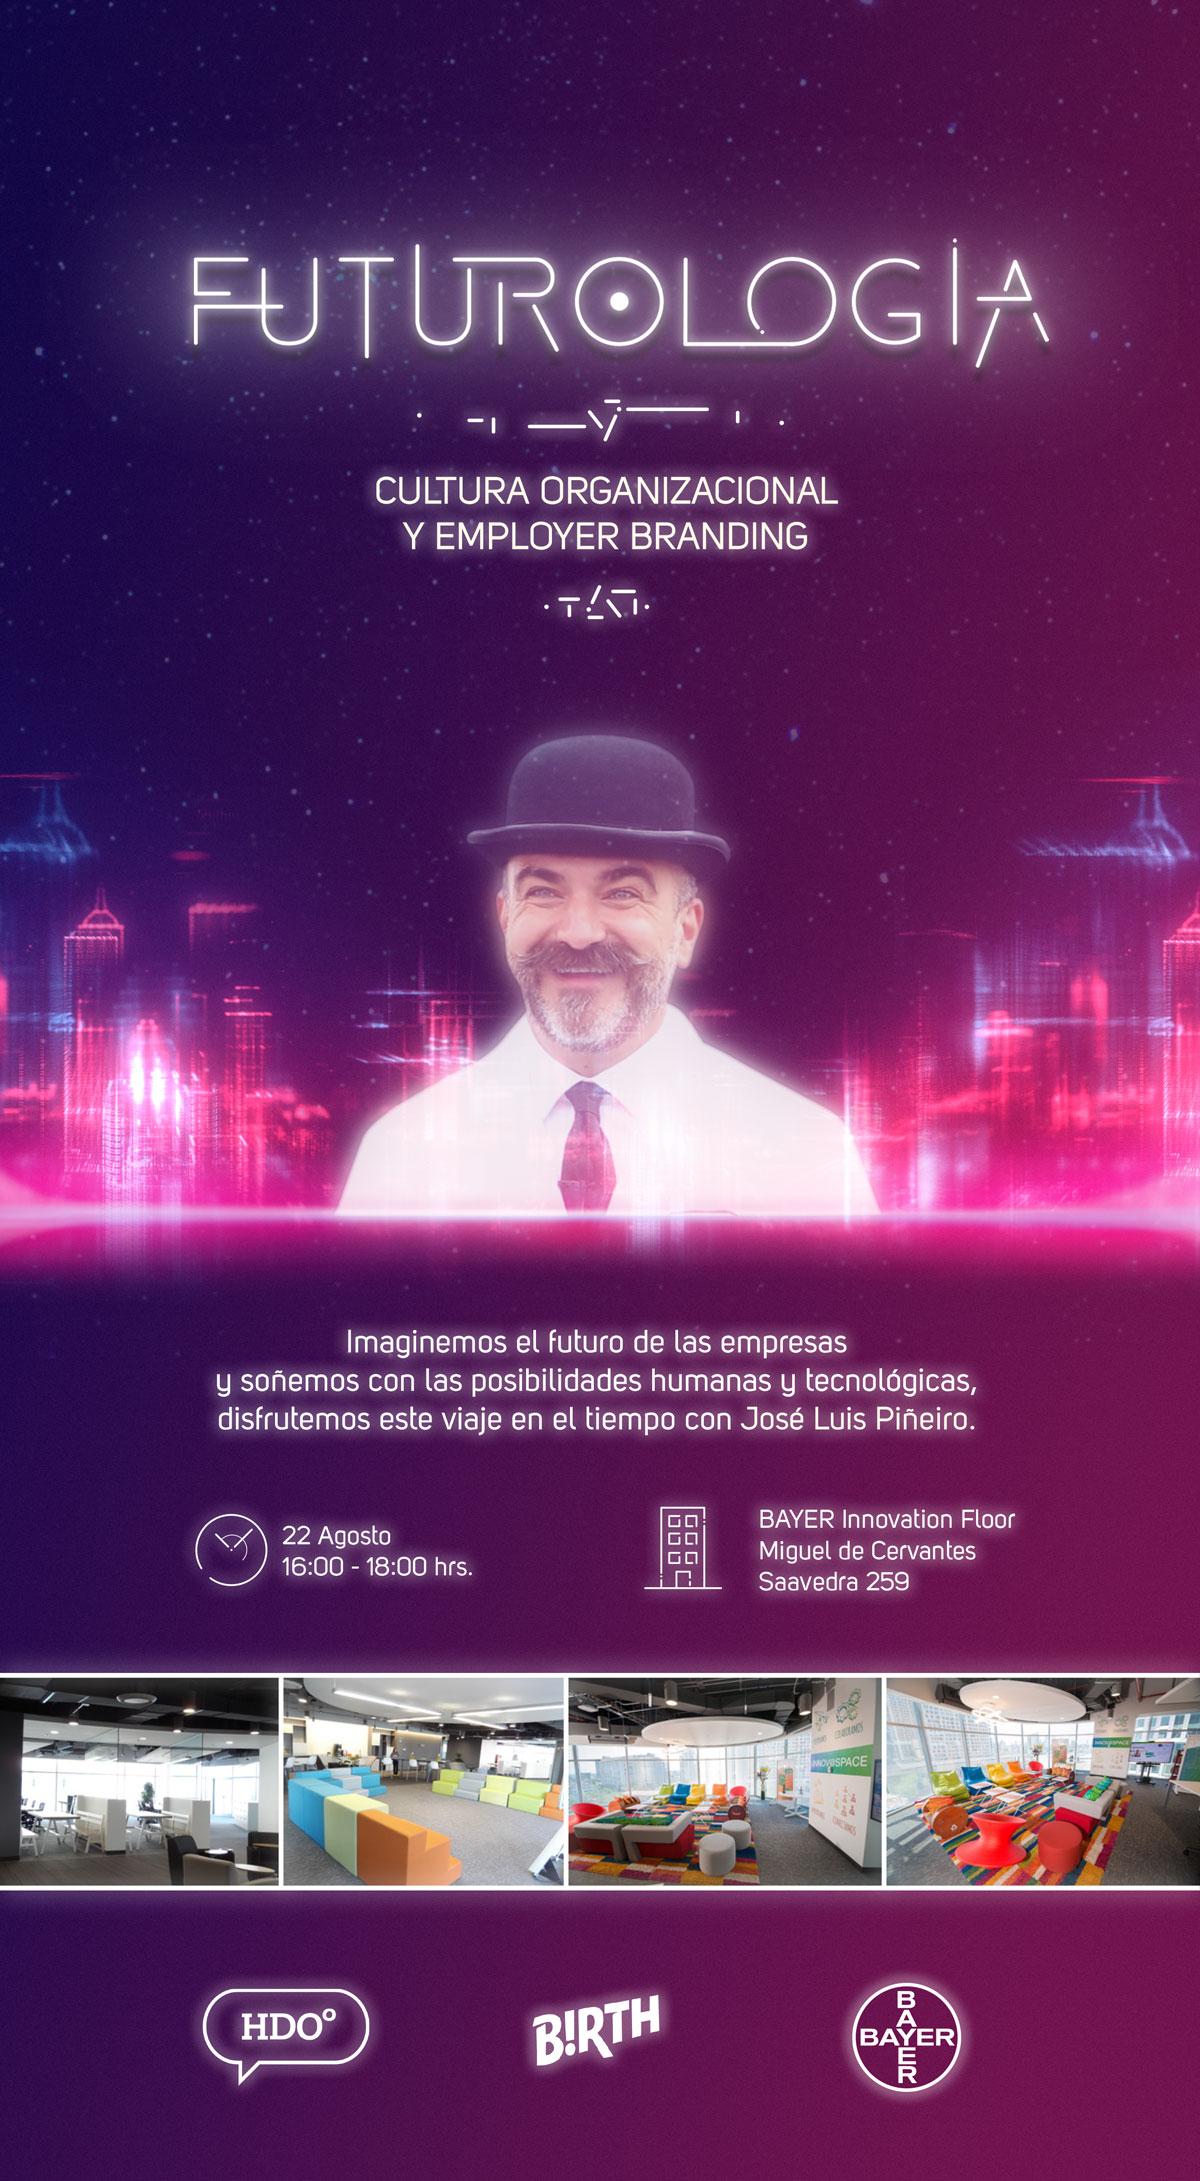 FUTUROLOGIA-NUEVO-Teaser-2.jpg